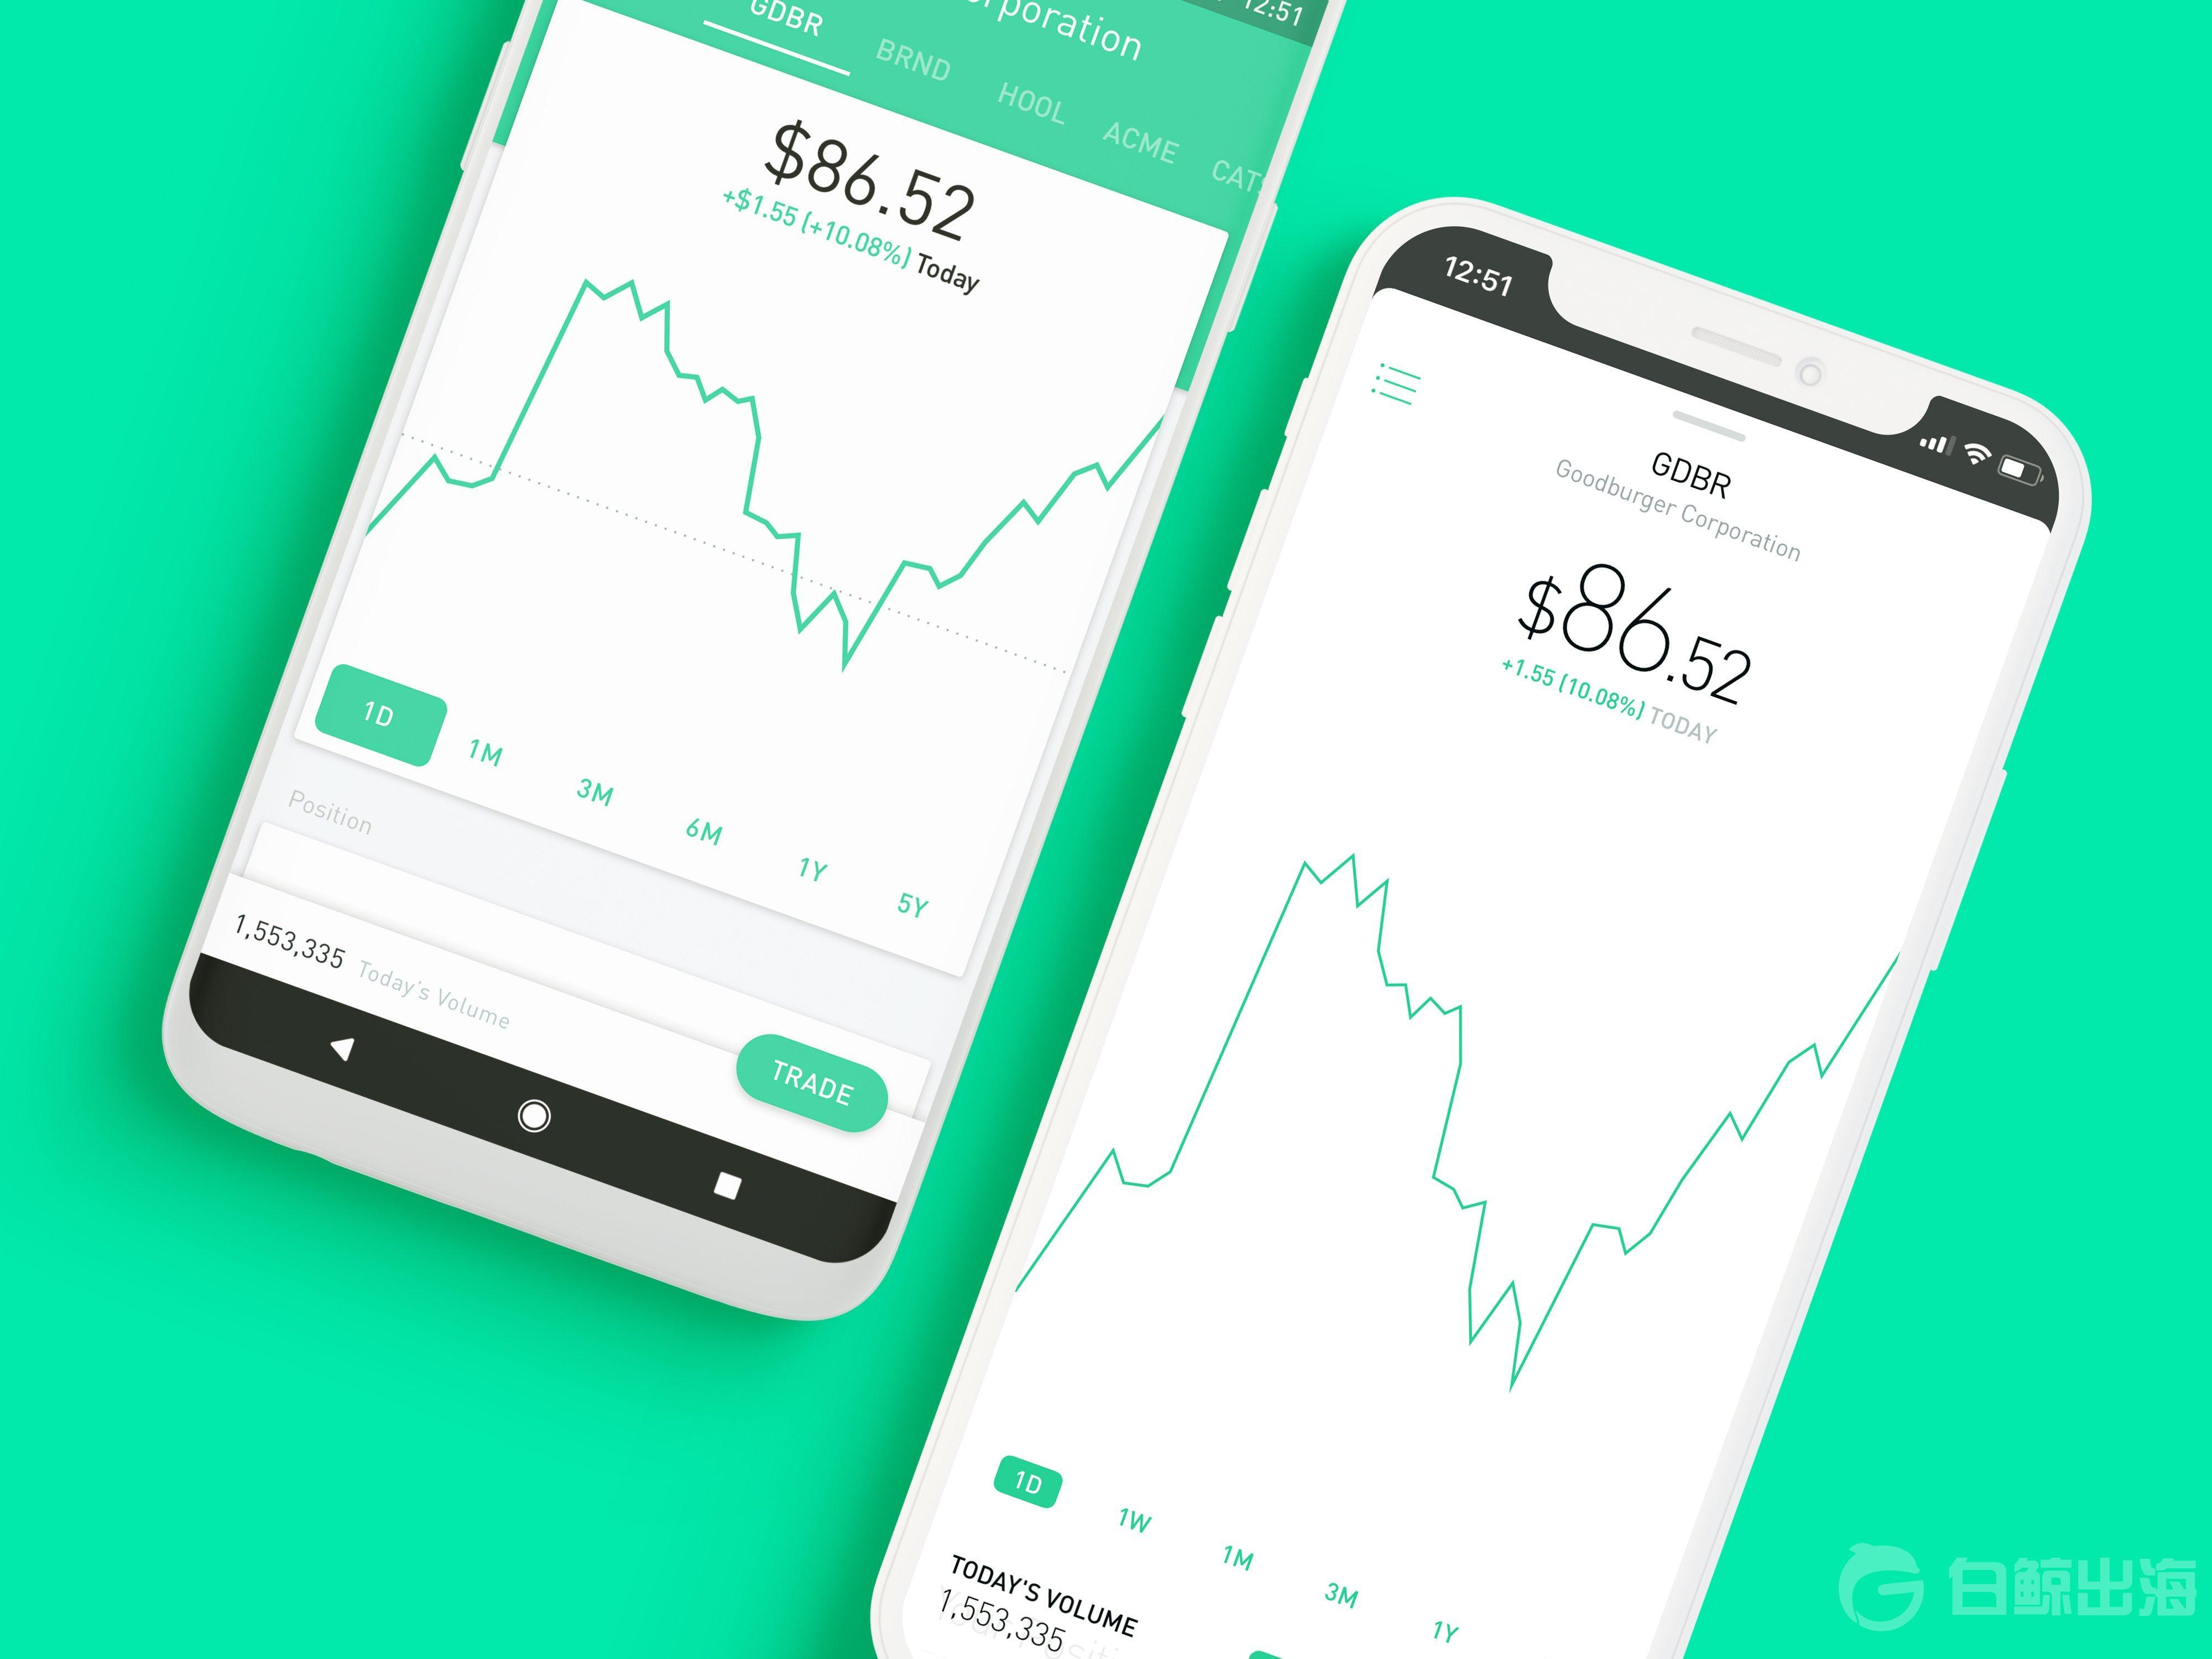 1534396784_robinhood-app-review-is-no-fee-stock-trading-safe.jpg